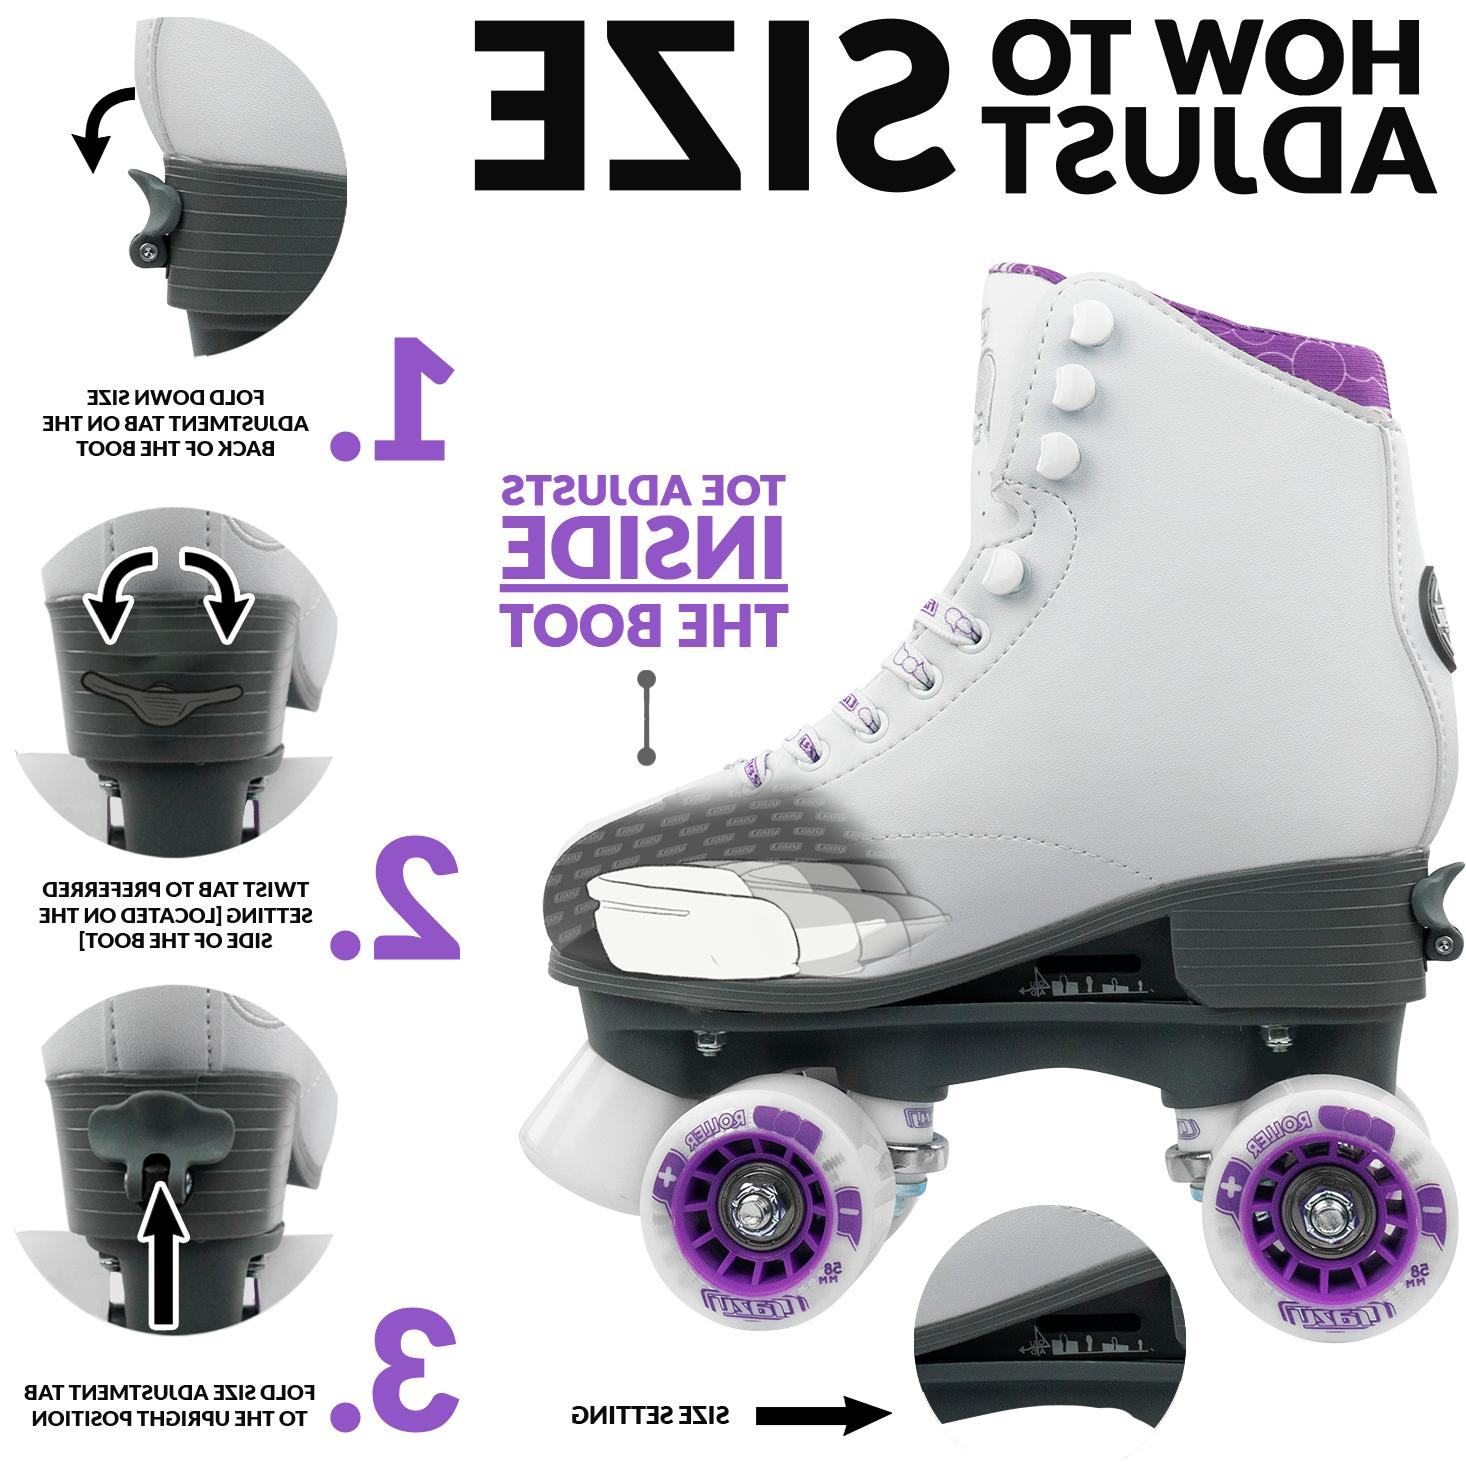 Pop Adjustable Skates for and Kids   White